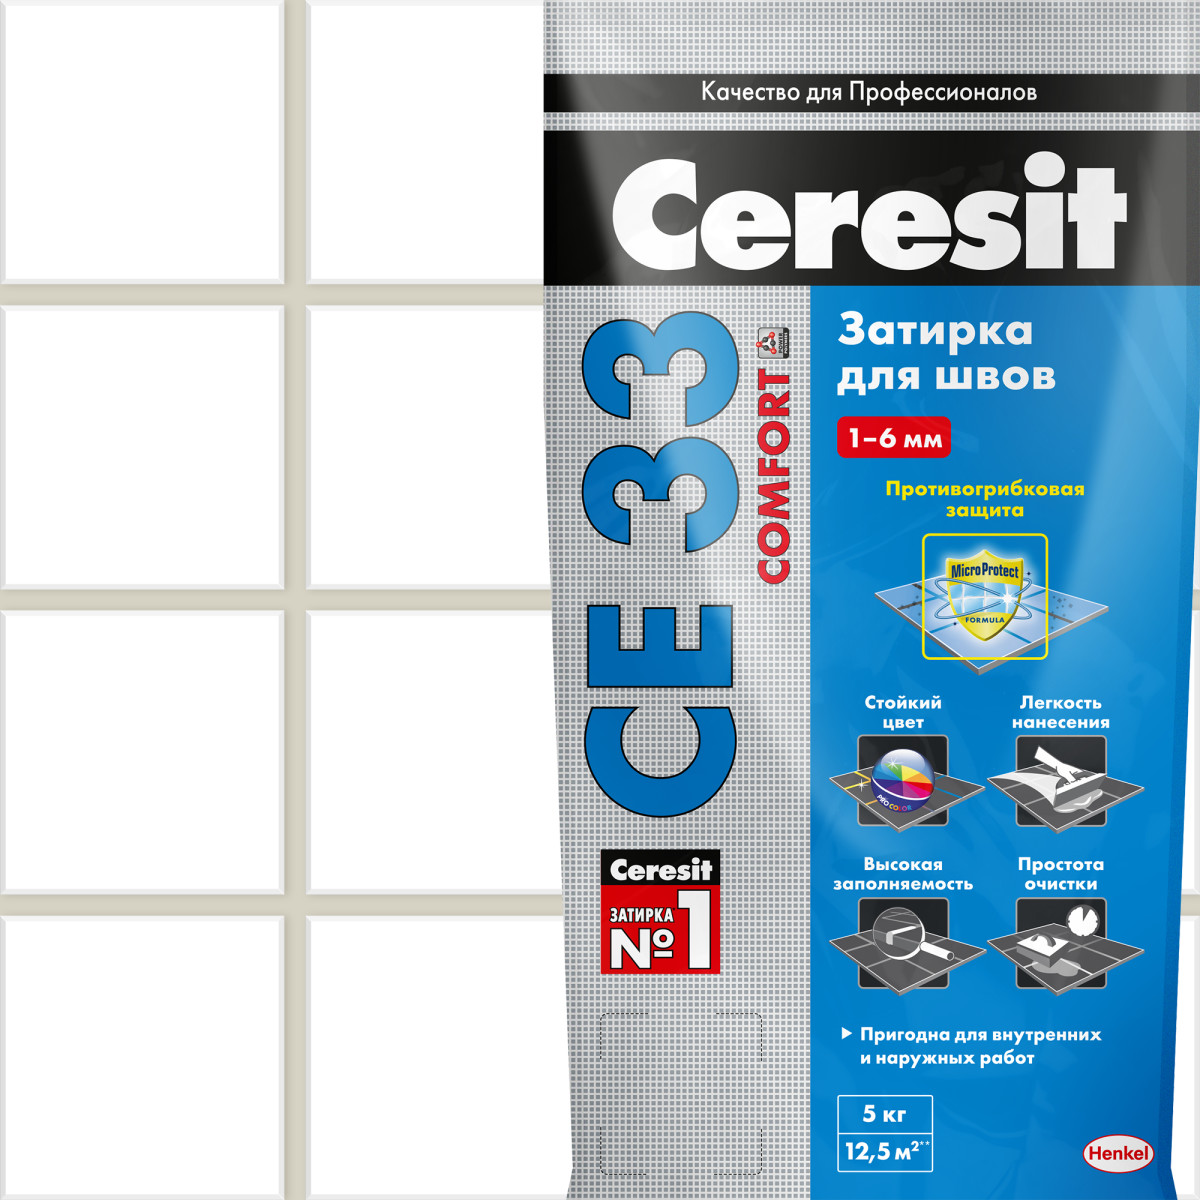 Затирка для узких швов Ceresit CE 33 Comfort ширина шва 2-6 мм 5 кг сталь цвет жасмин